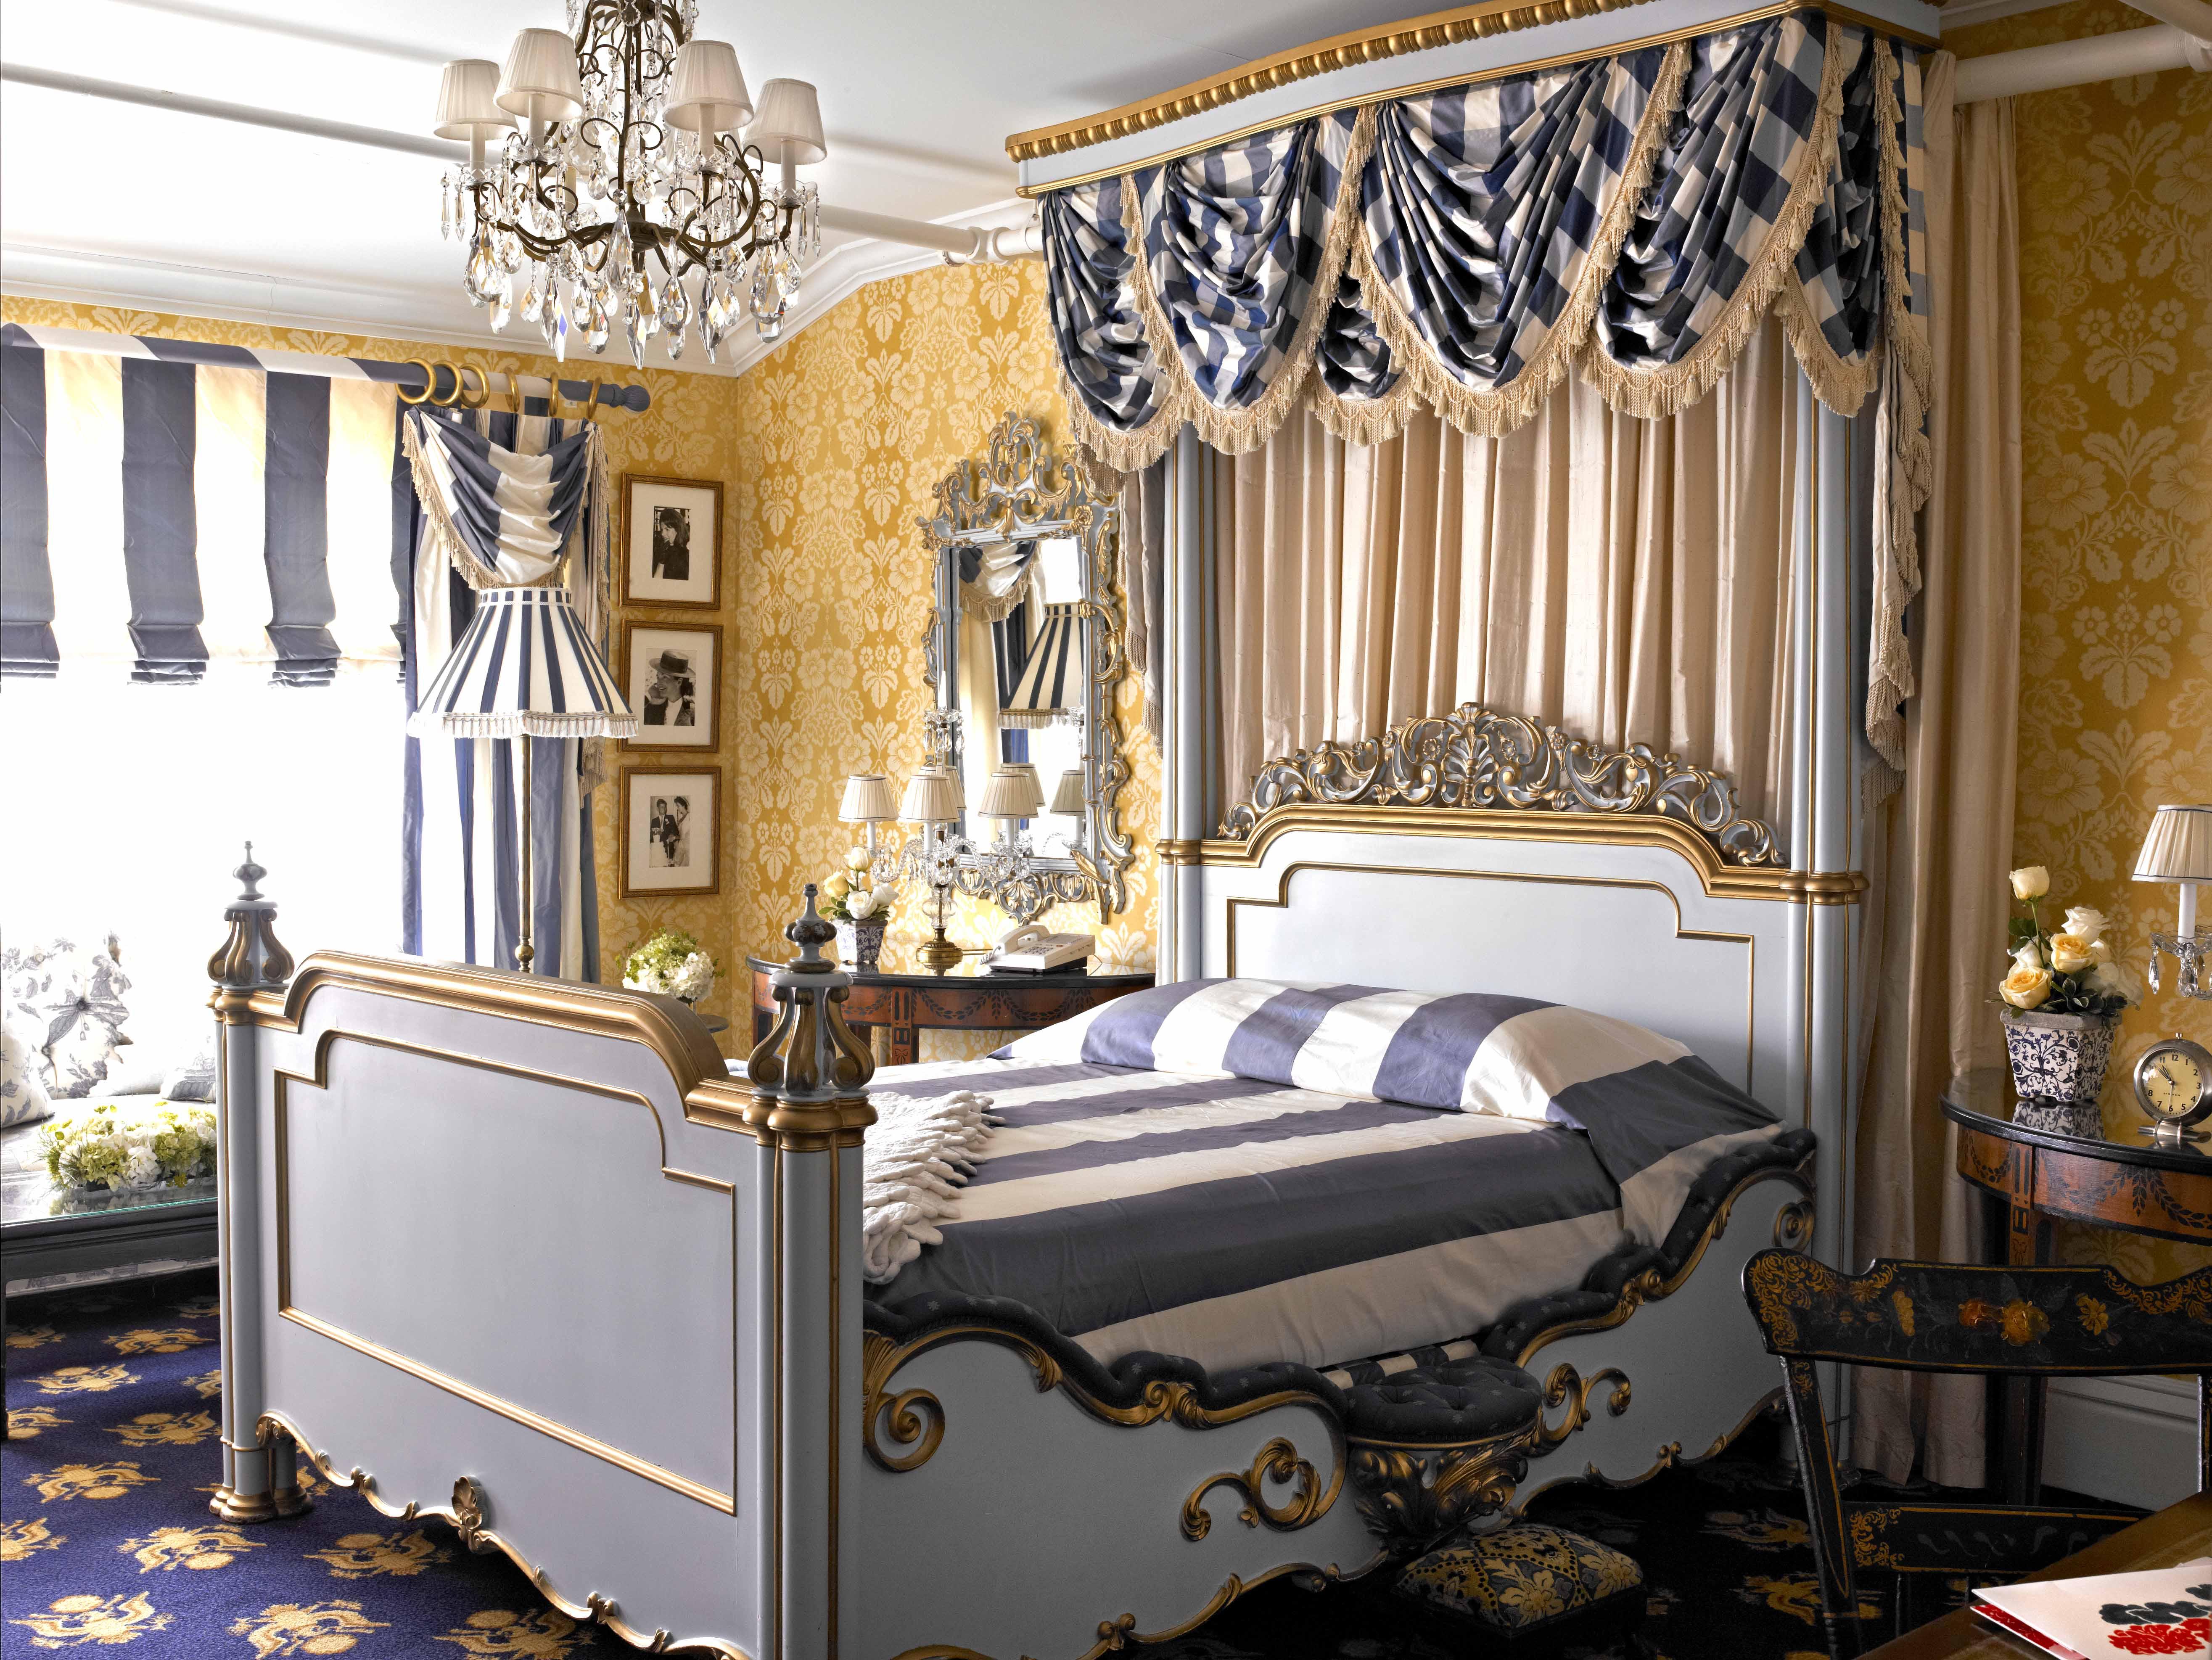 The Grand Hotel – design by Dorothy Draper & Company graphic